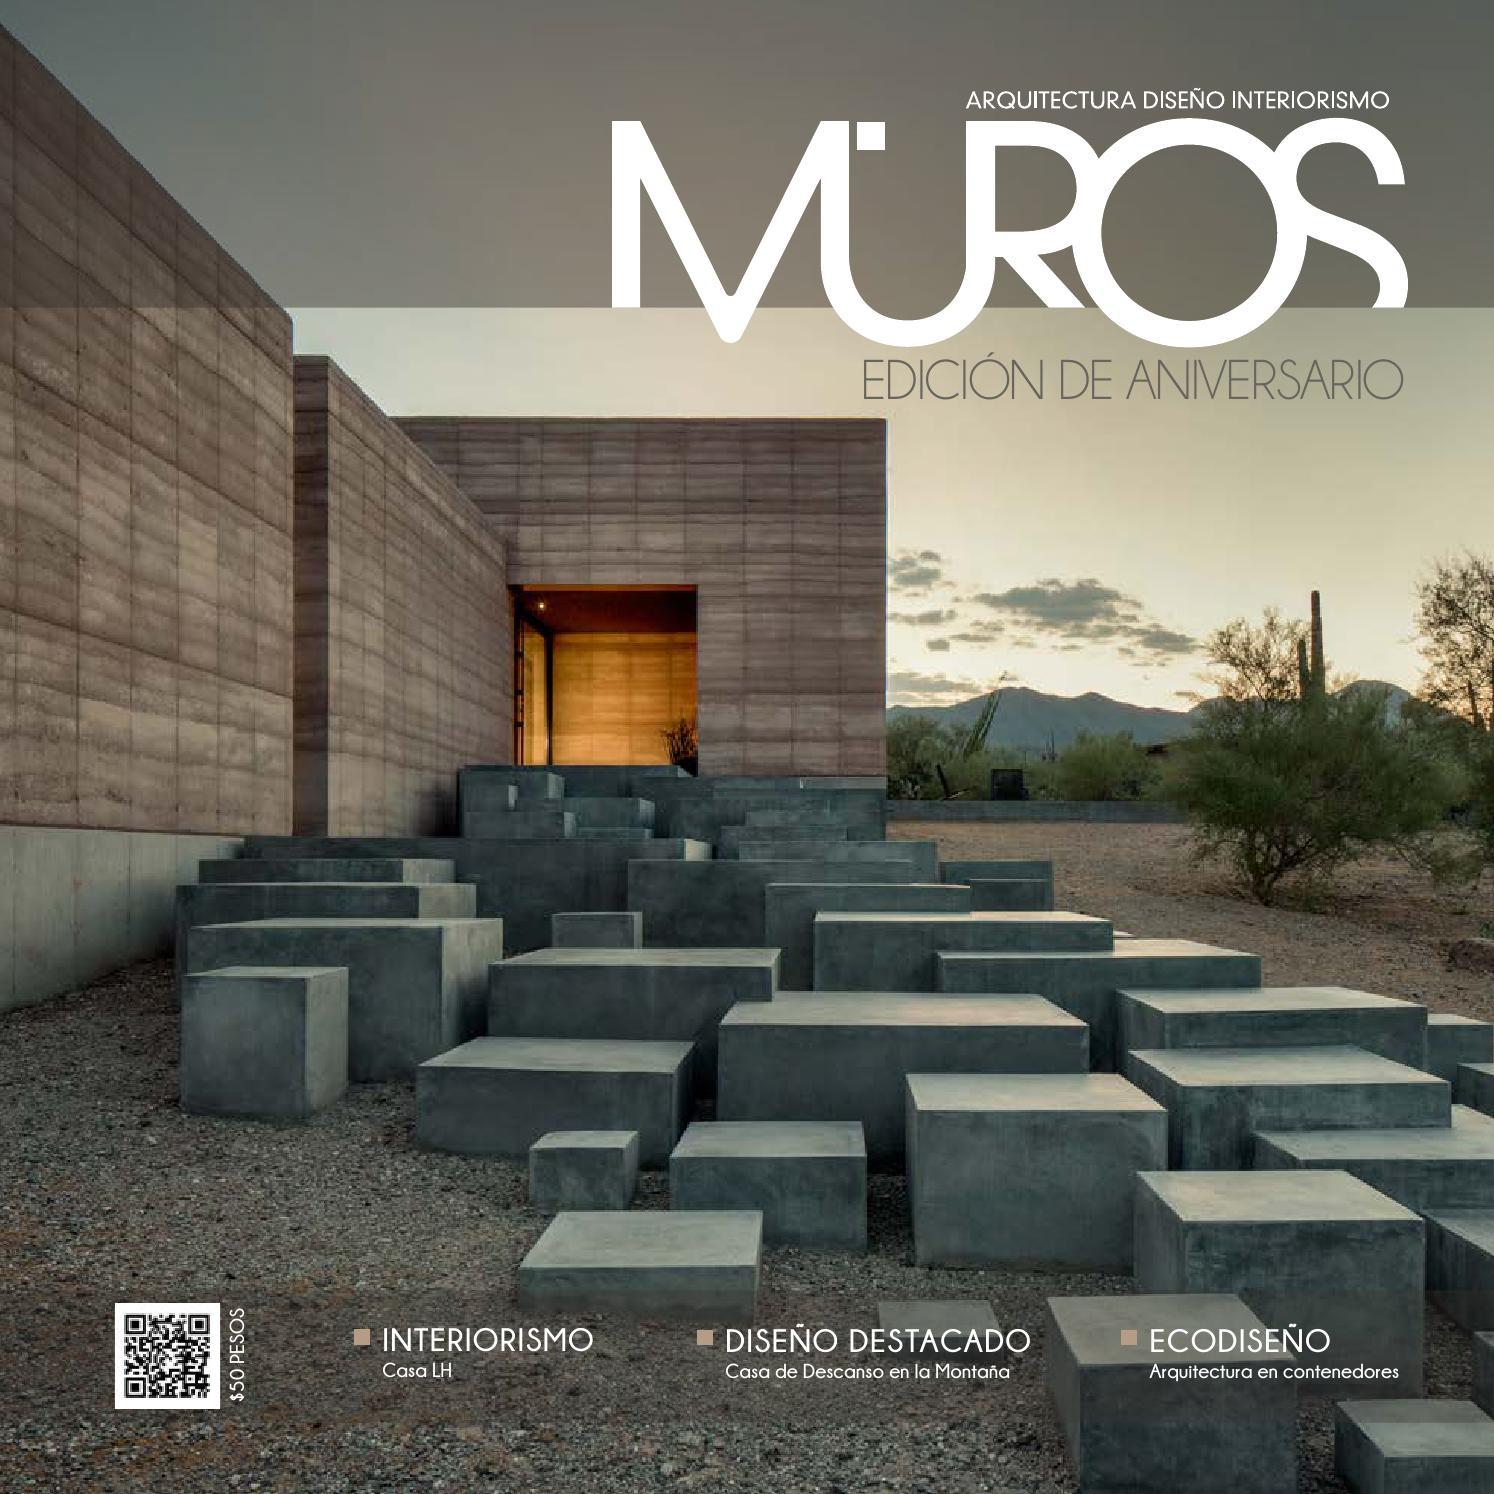 Edici n 6 aniversario revista muros arquitectura - Arquitectura de diseno ...